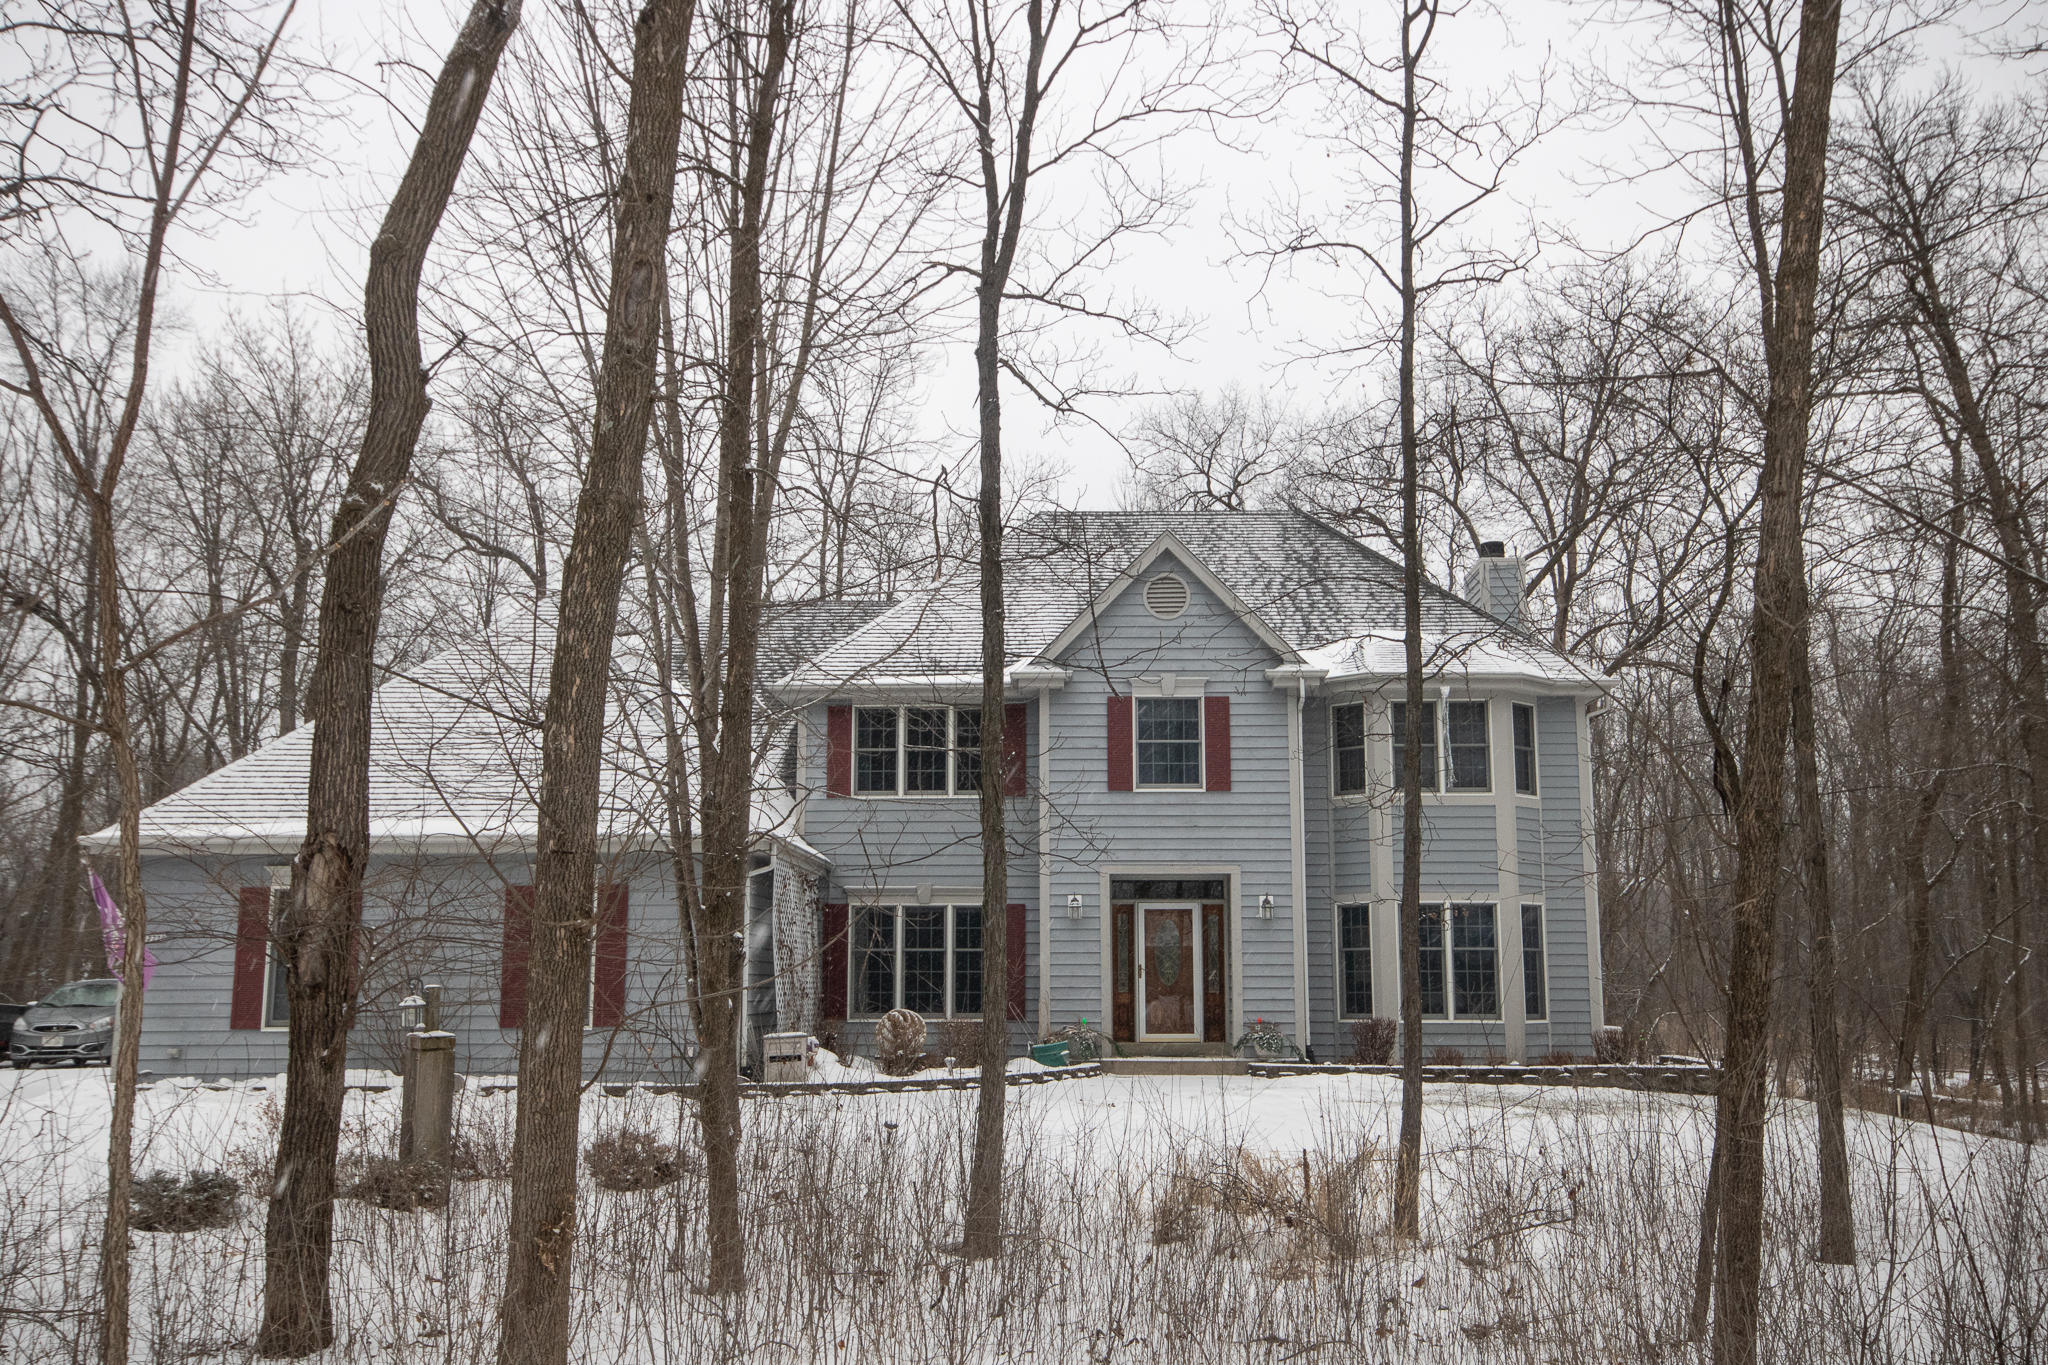 17720 Lucy Cir, Brookfield, Wisconsin 53045, 5 Bedrooms Bedrooms, ,3 BathroomsBathrooms,Single-Family,For Sale,Lucy Cir,1621445